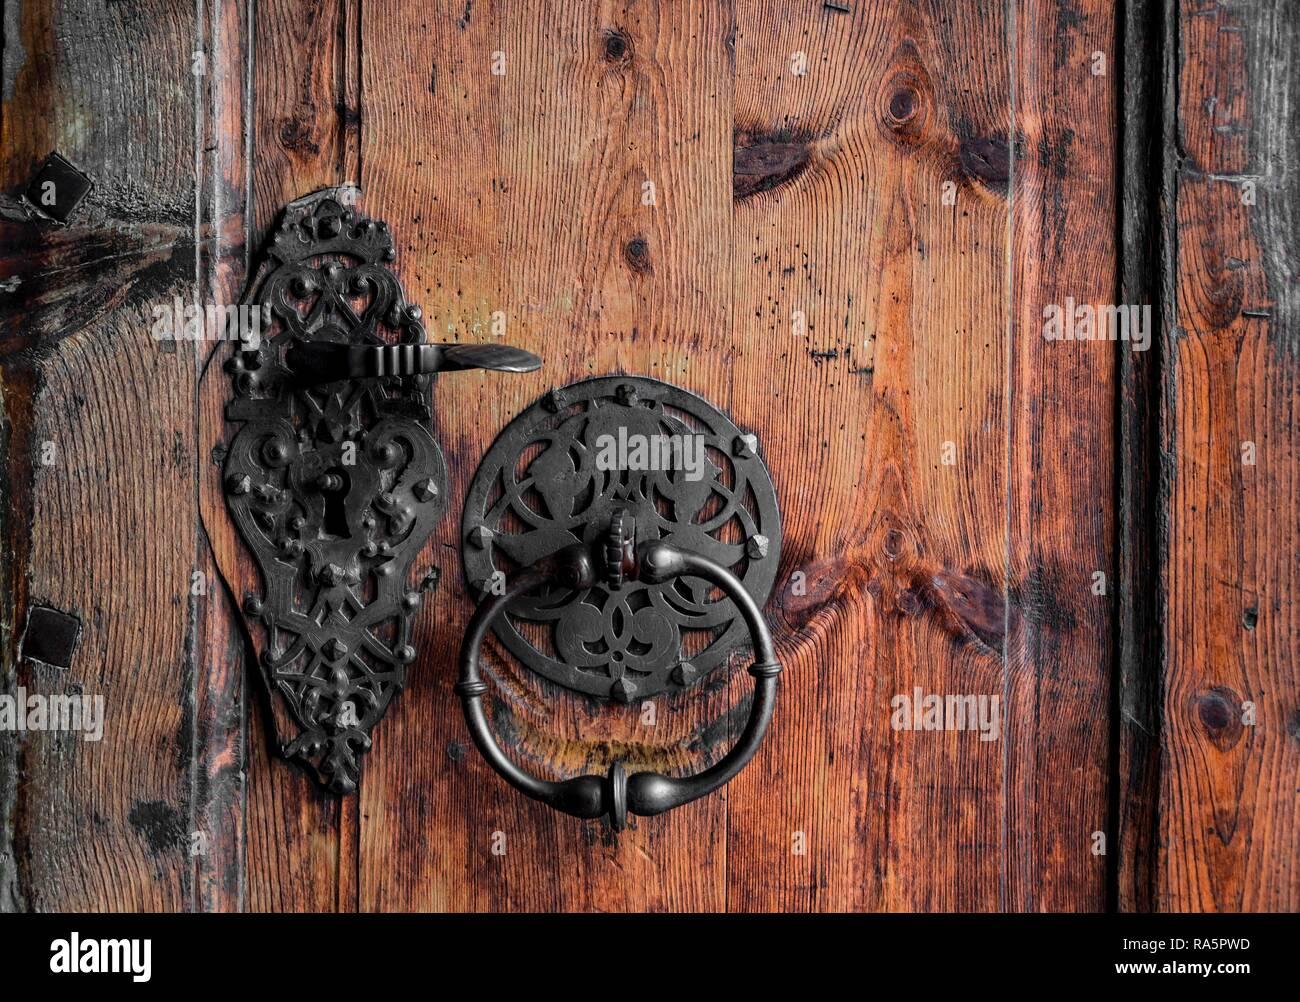 Forged door handle and knocker on an old wooden door, Austria - Stock Image